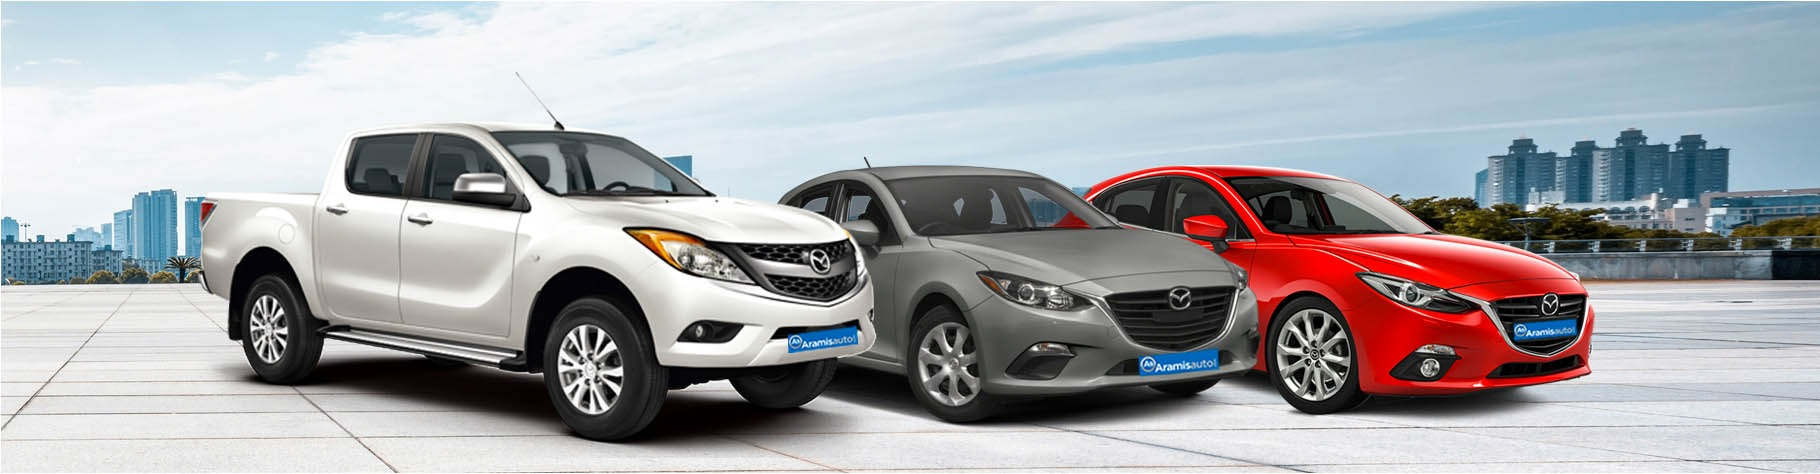 Guide d'achat Mazda